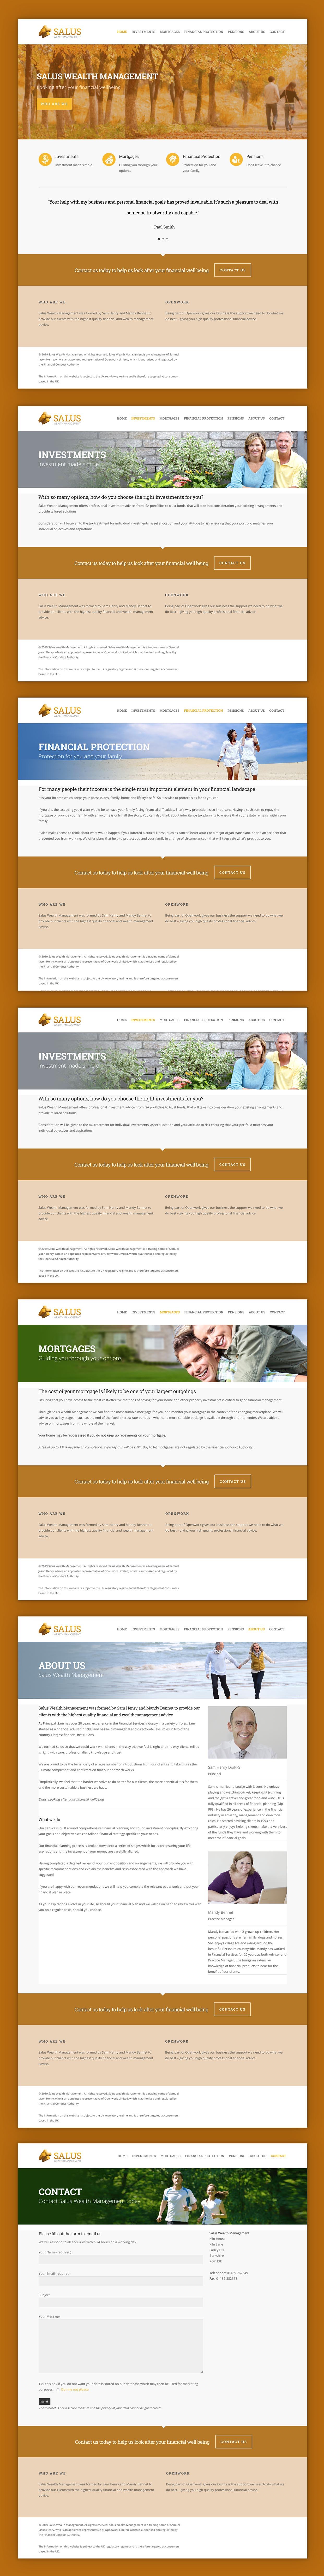 Salus Wealth Management Website Pages Mobile